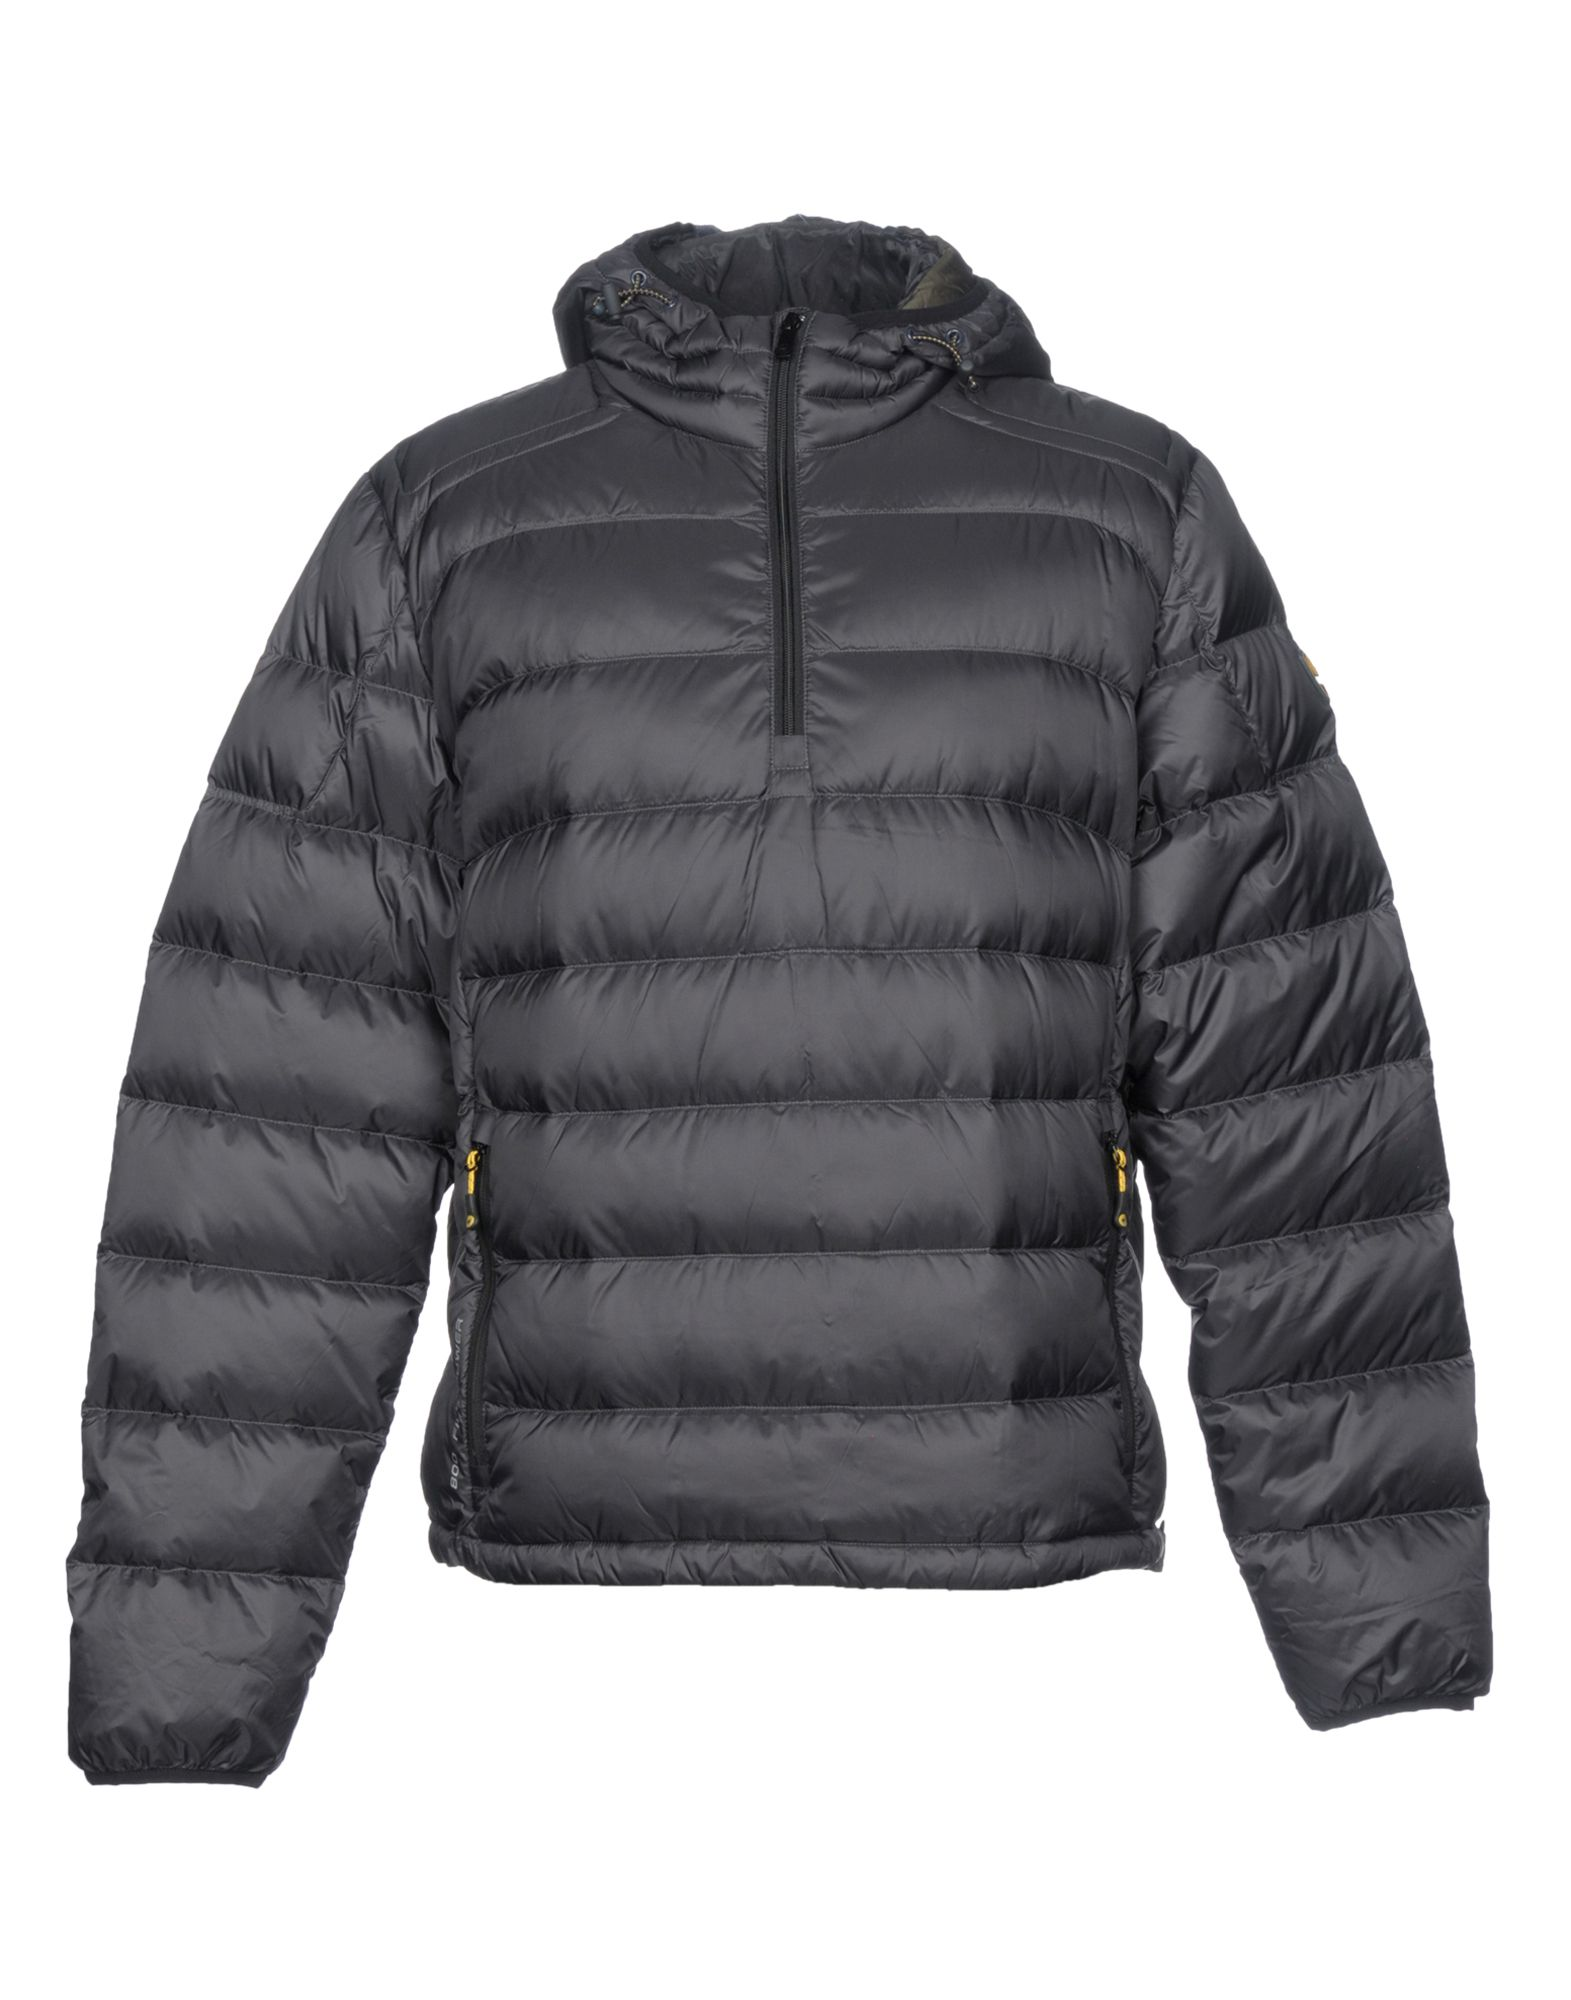 negozio online 573c4 693e6 CIESSE PIUMINI Down jacket - Coats and Jackets U | YOOX.COM